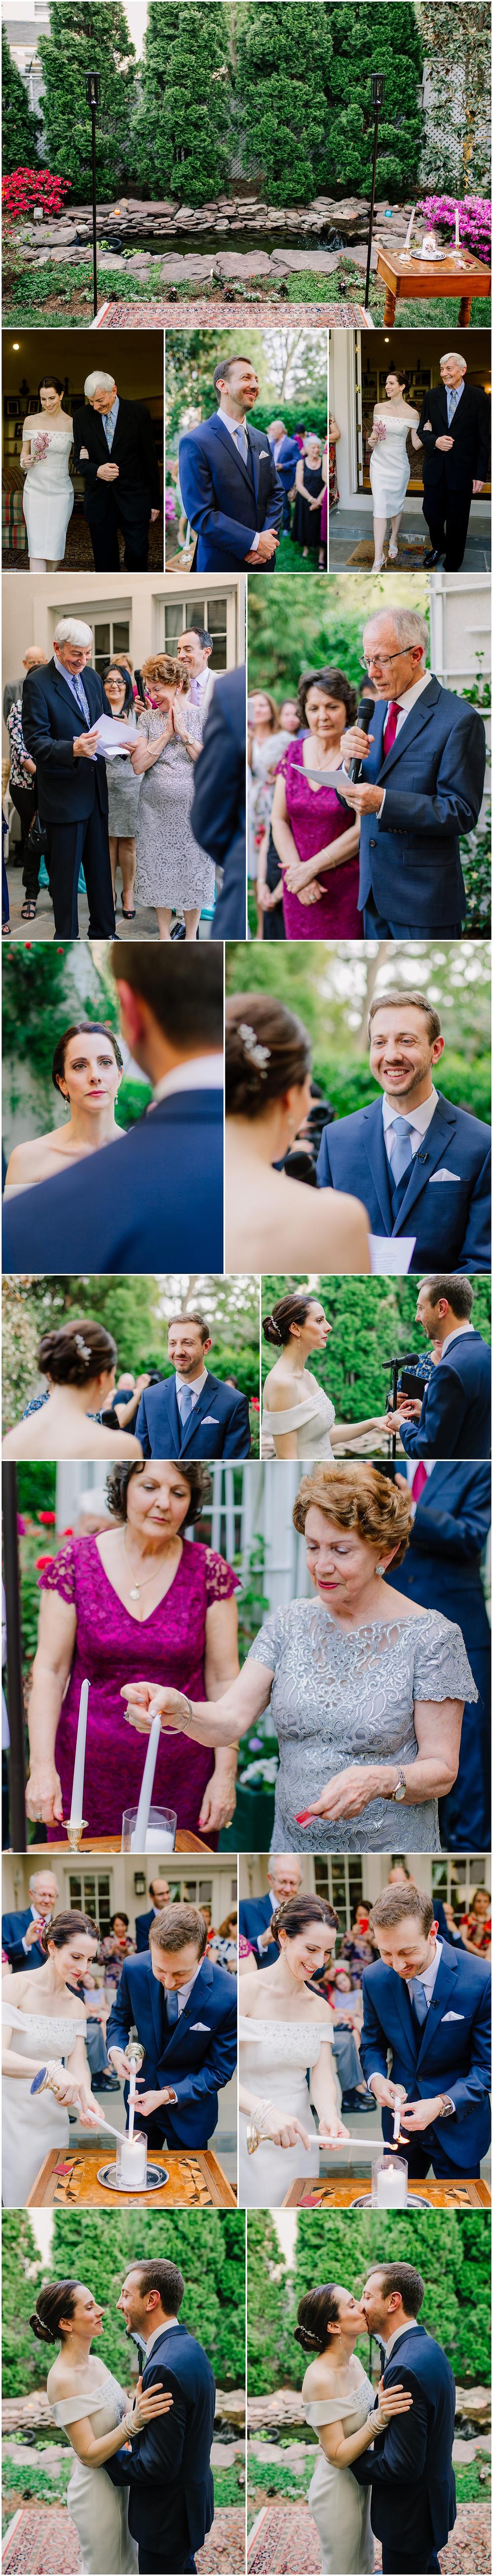 Intimate Chevy Chase Maryland Backyard Wedding Ceremony